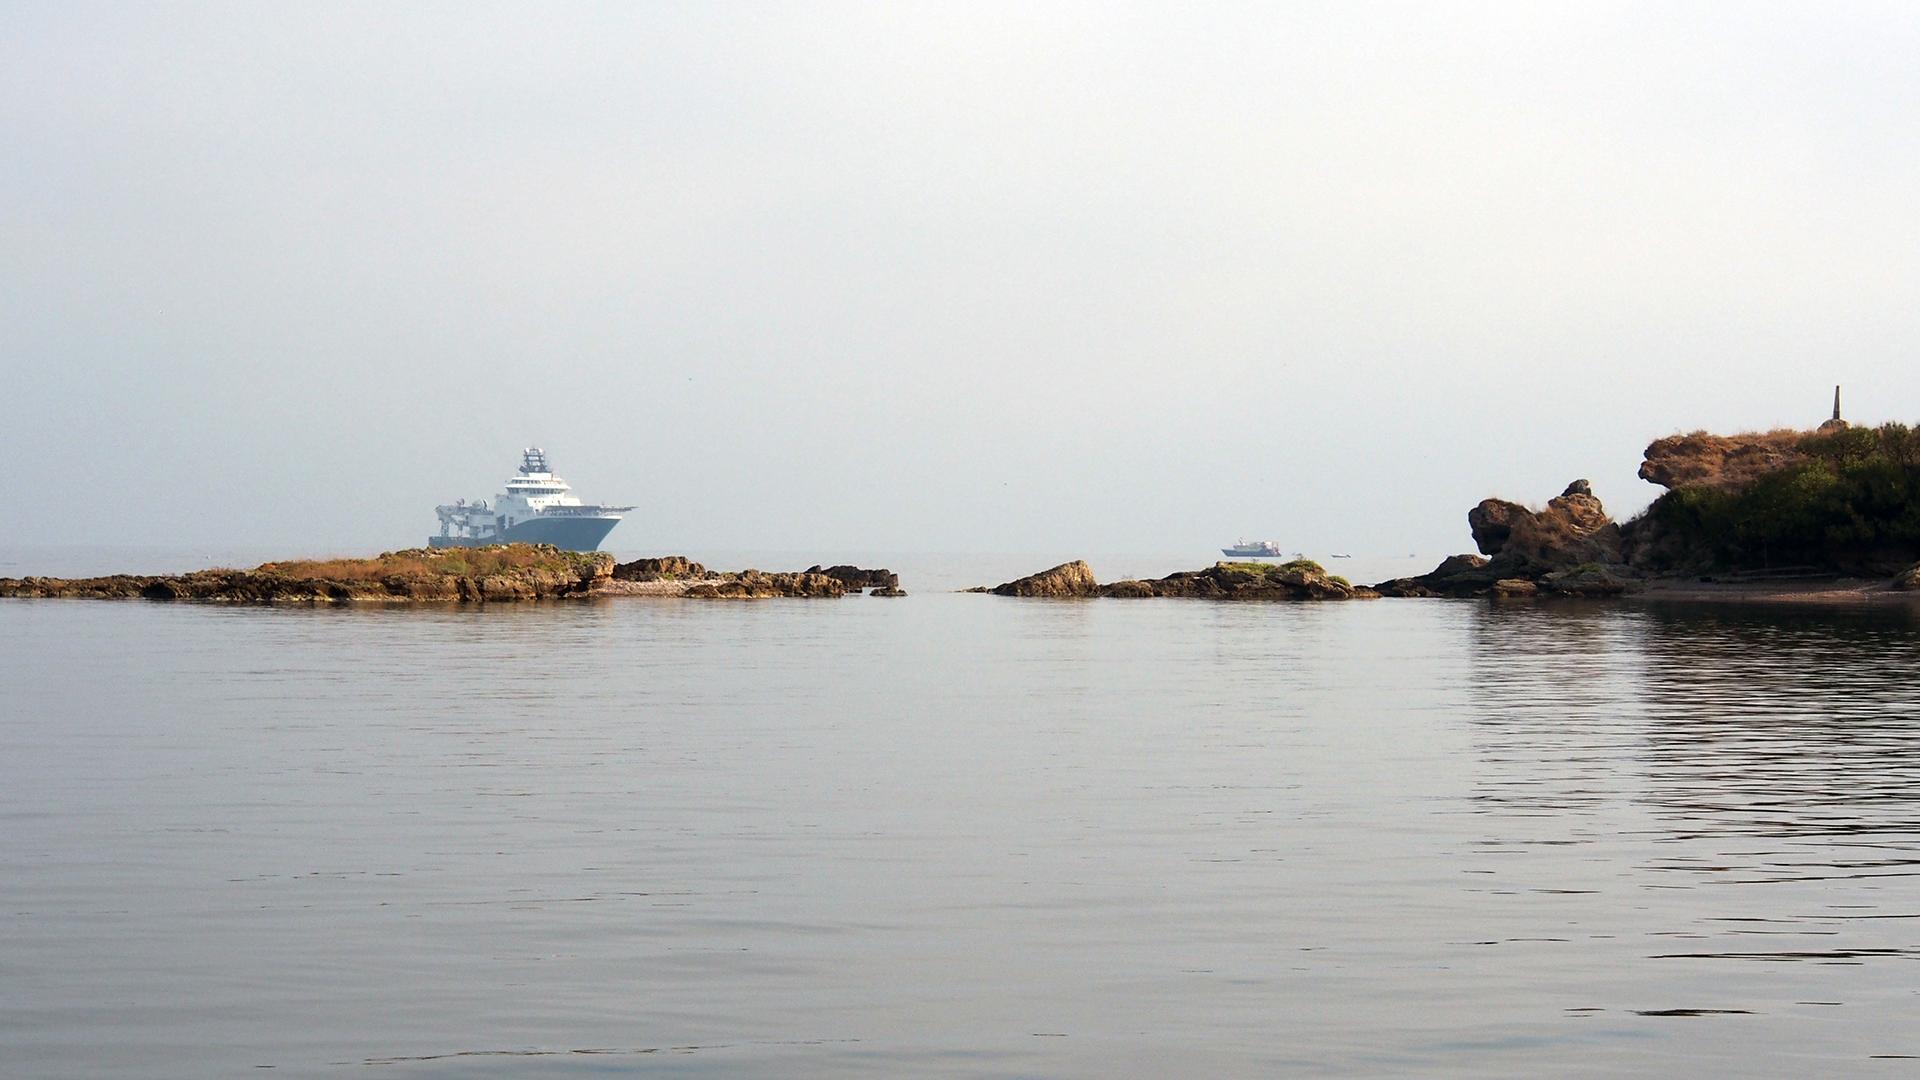 прогулка на парусной яхте корабль фото